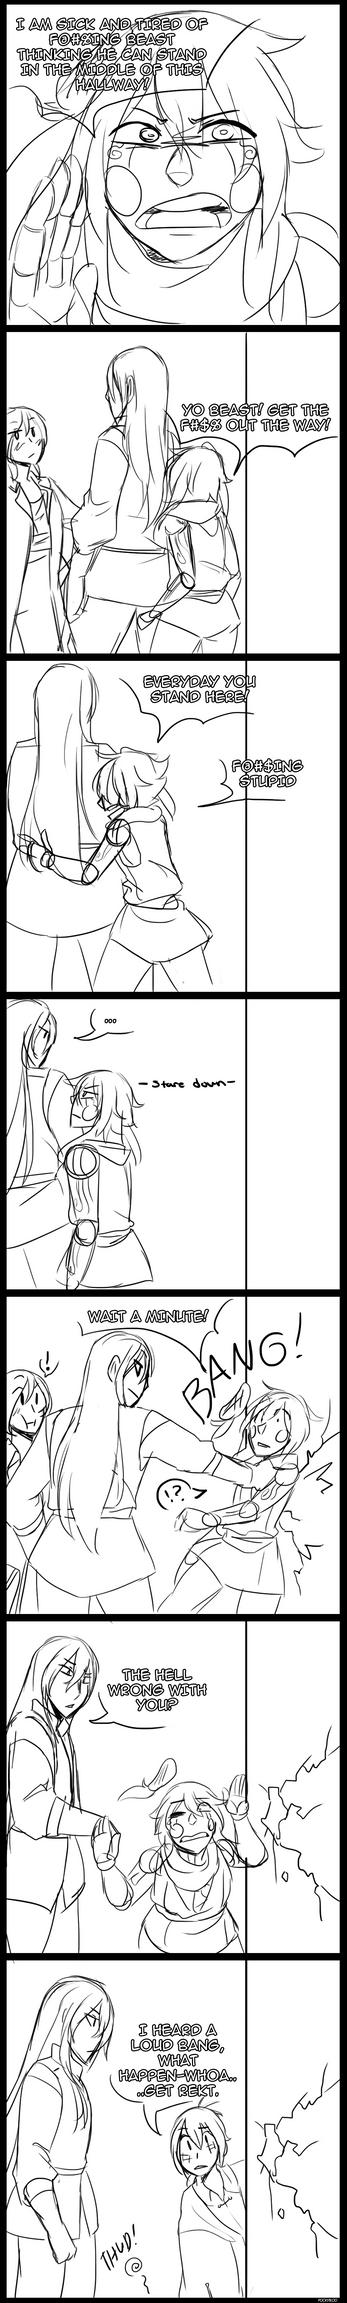 Pinokuni vs. Beast by PockyBloo